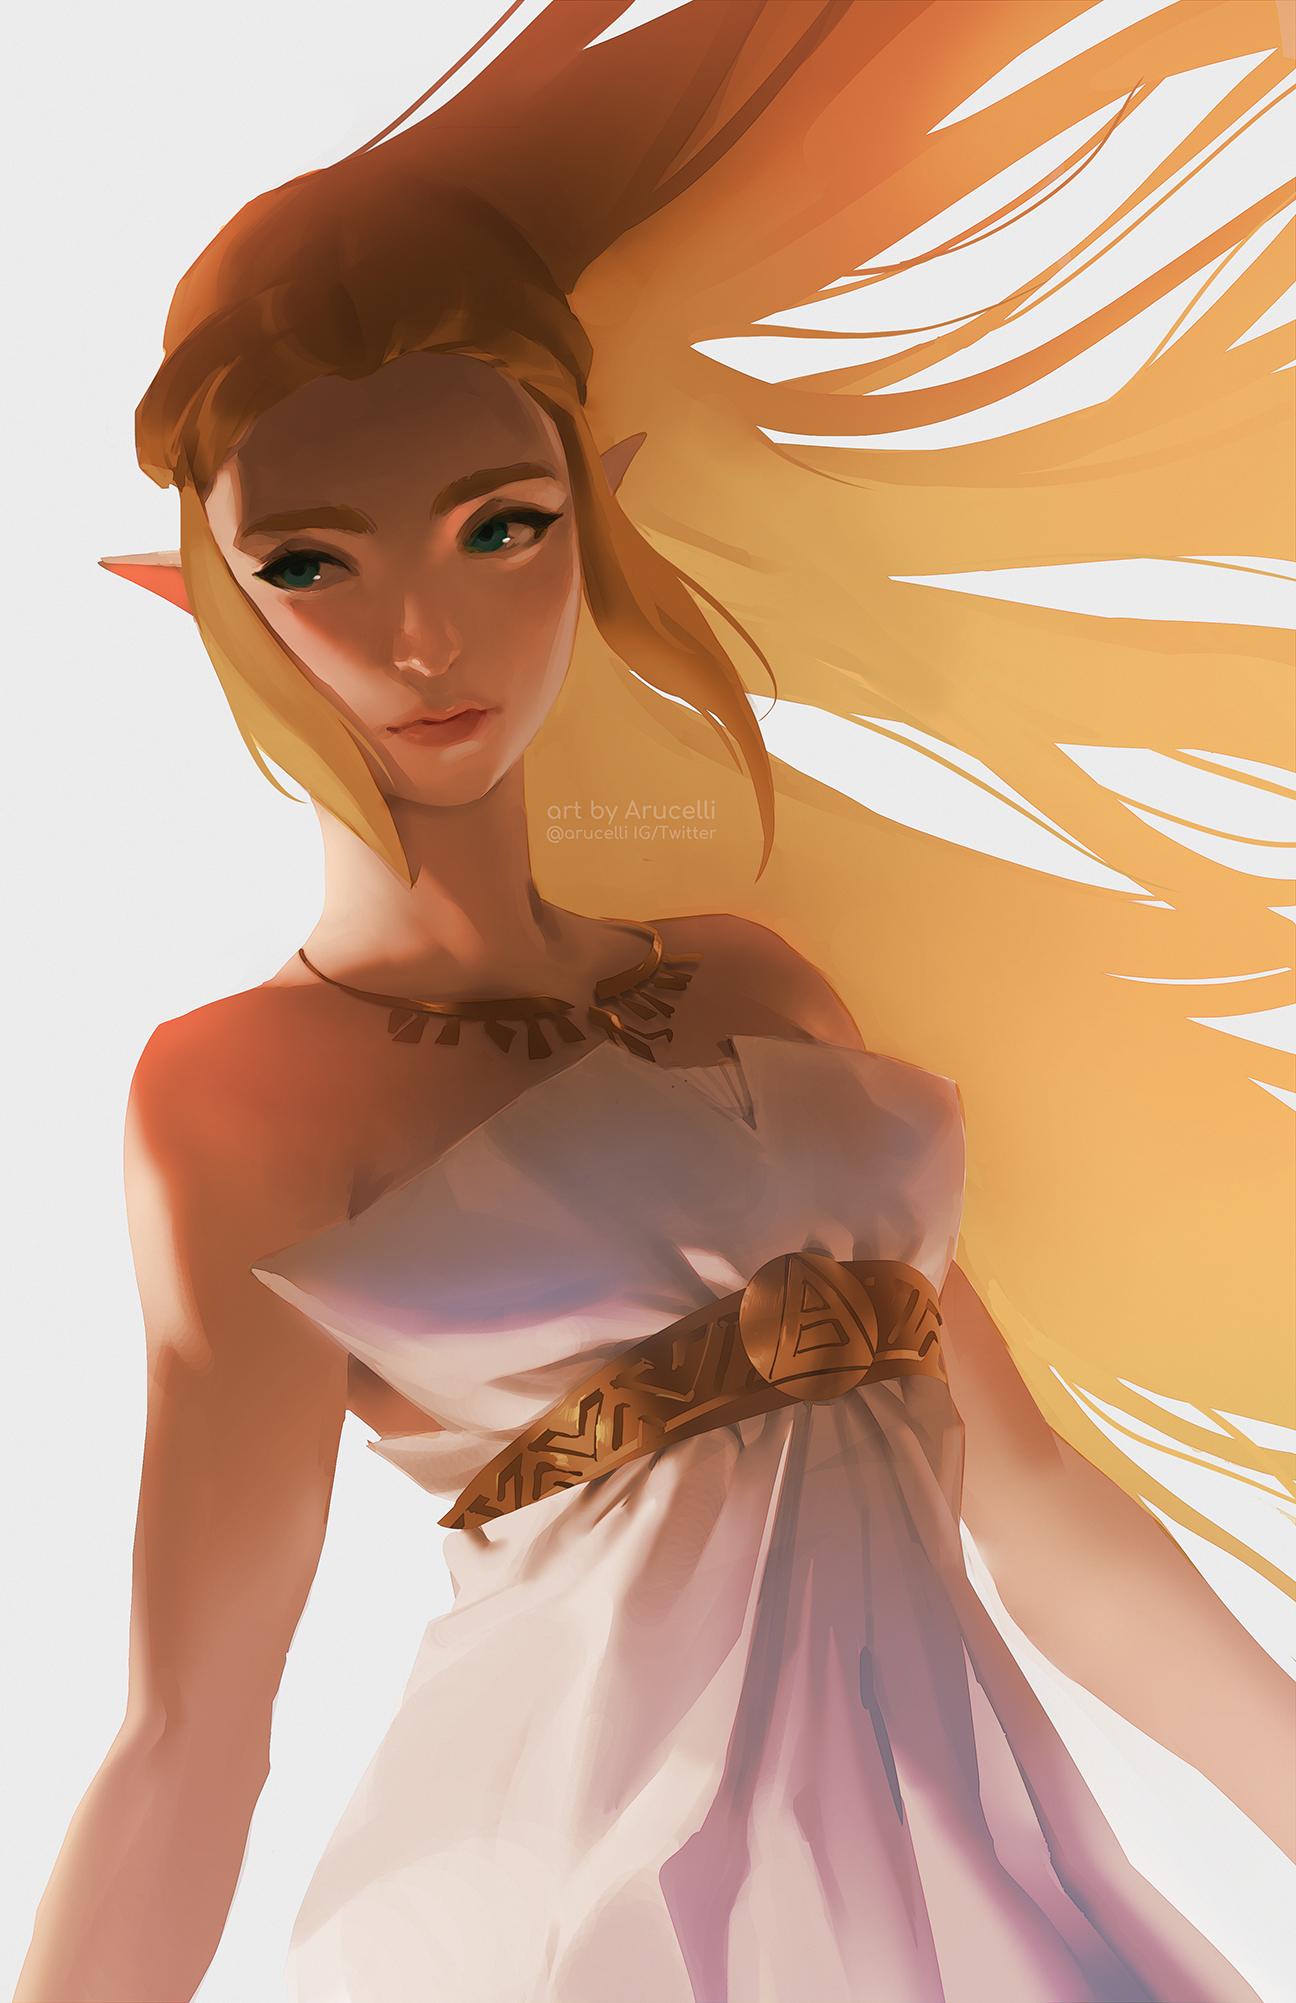 GirlsclubAsia-ConceptArtist-Illustrator- Knight Zhang-zelda2